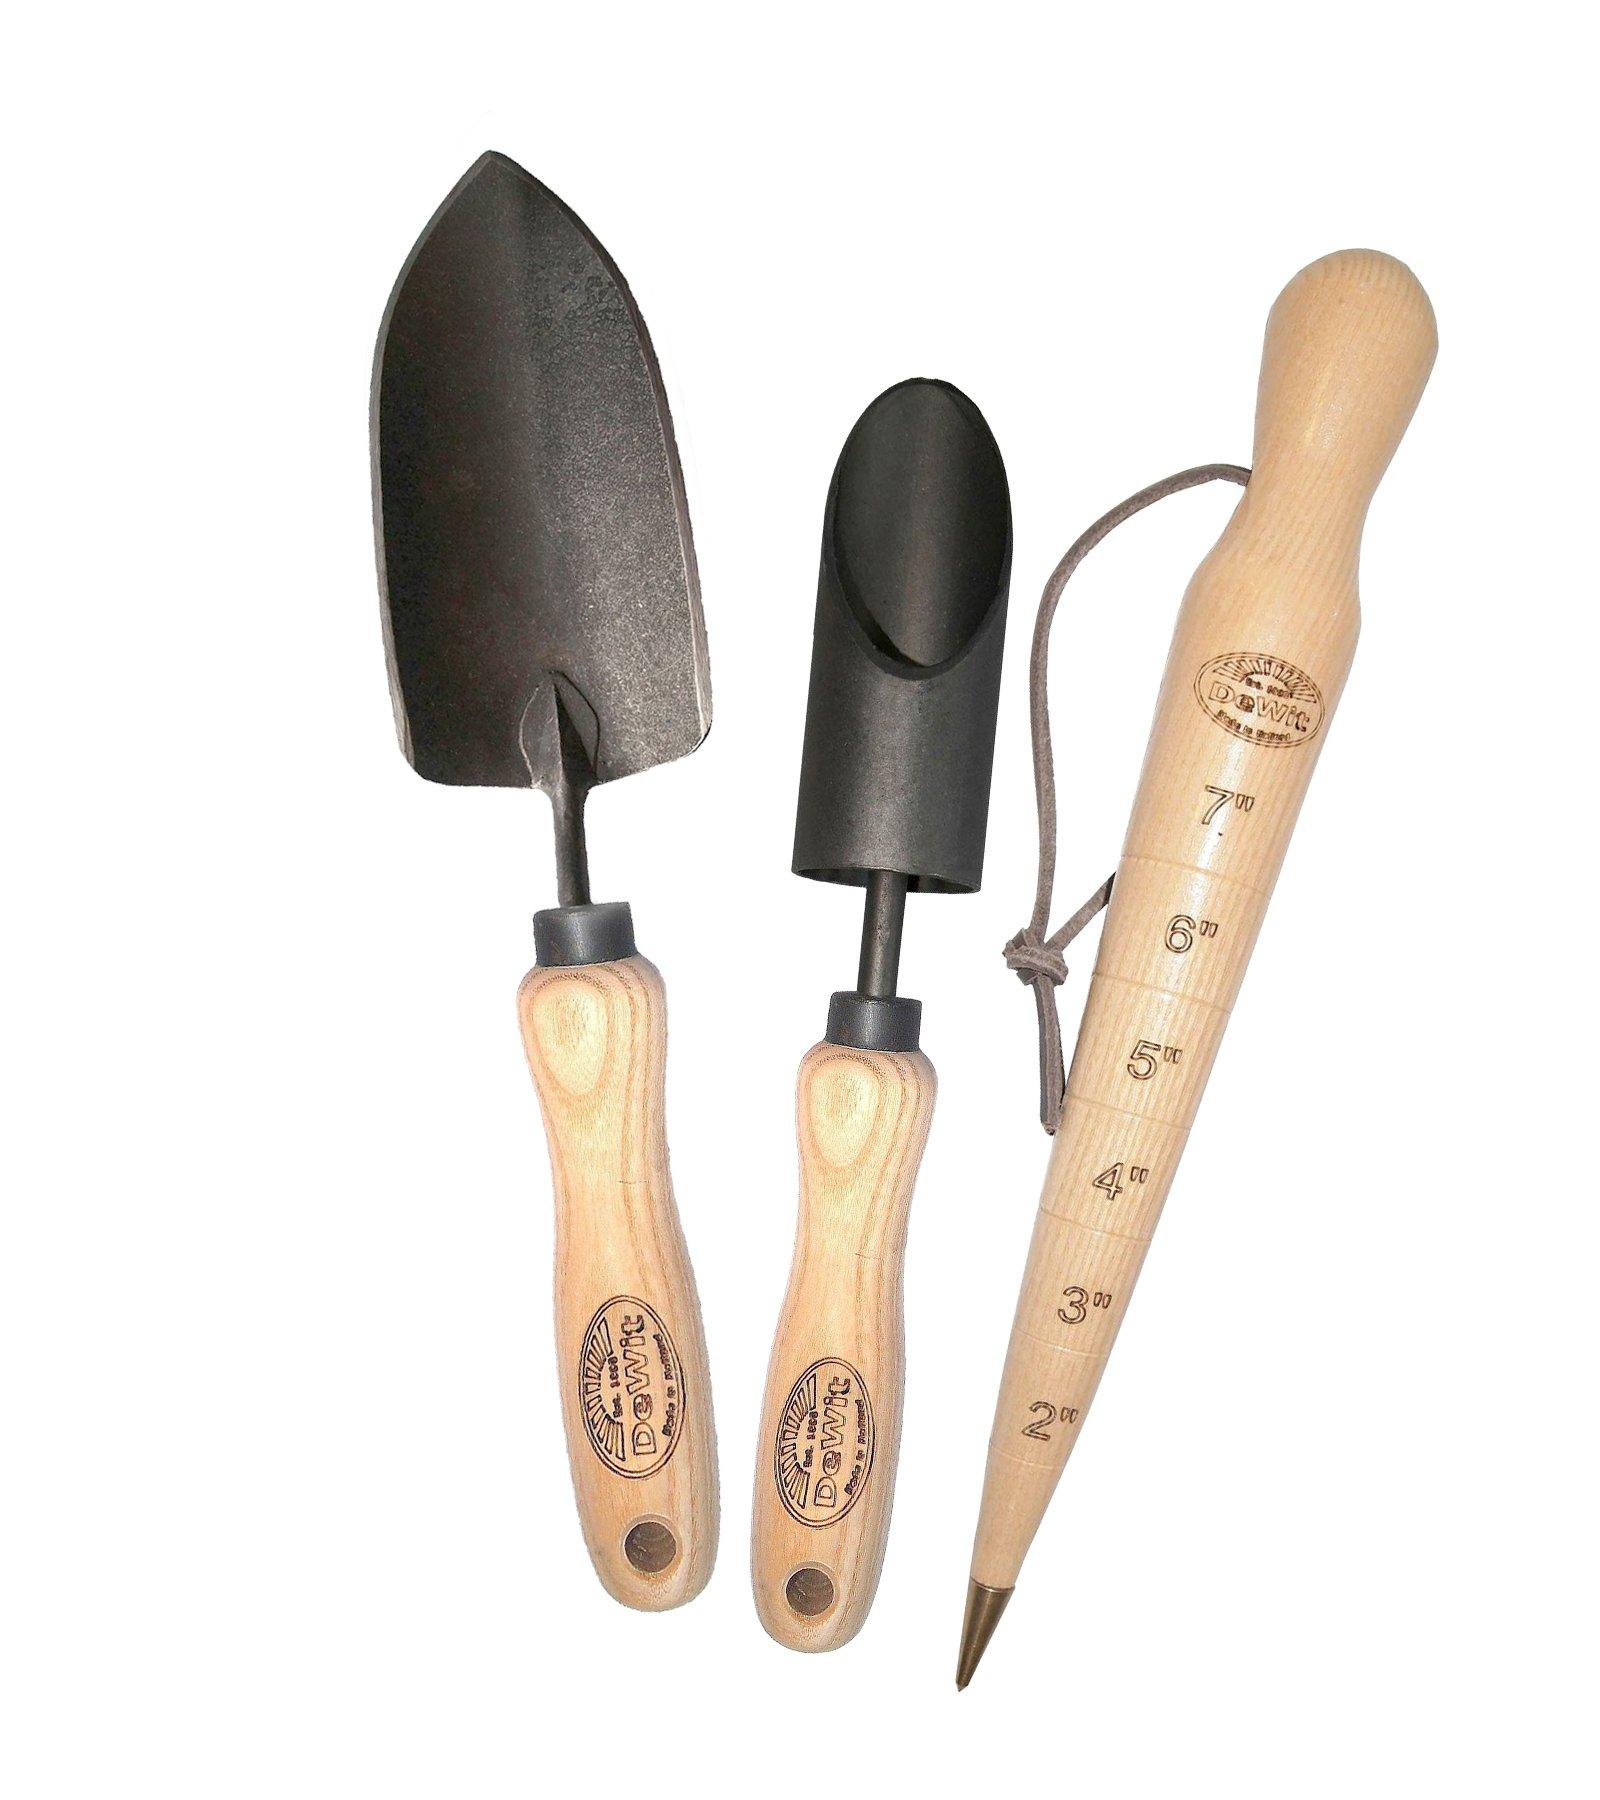 Tierra Garden DeWit 31-3336 Tool Bulb Planting Kit